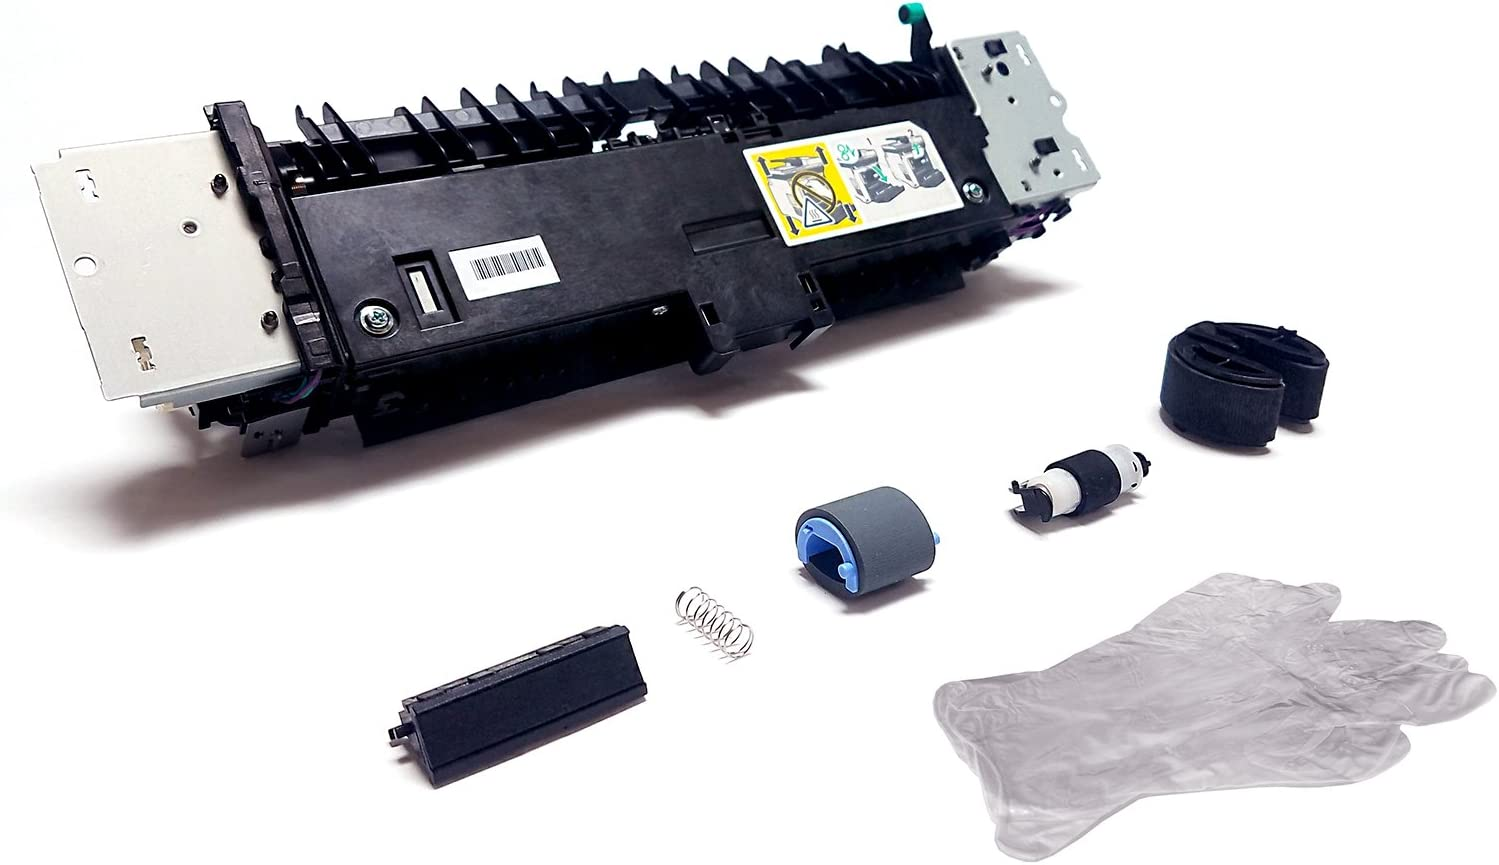 Altru Print RM1-8054-MK-AP (RM2-5177) Maintenance Kit for HP Color Laserjet Pro M351 / M451 (110V) Includes RM1-8054 Fuser, Tray 1 & 2 Rollers